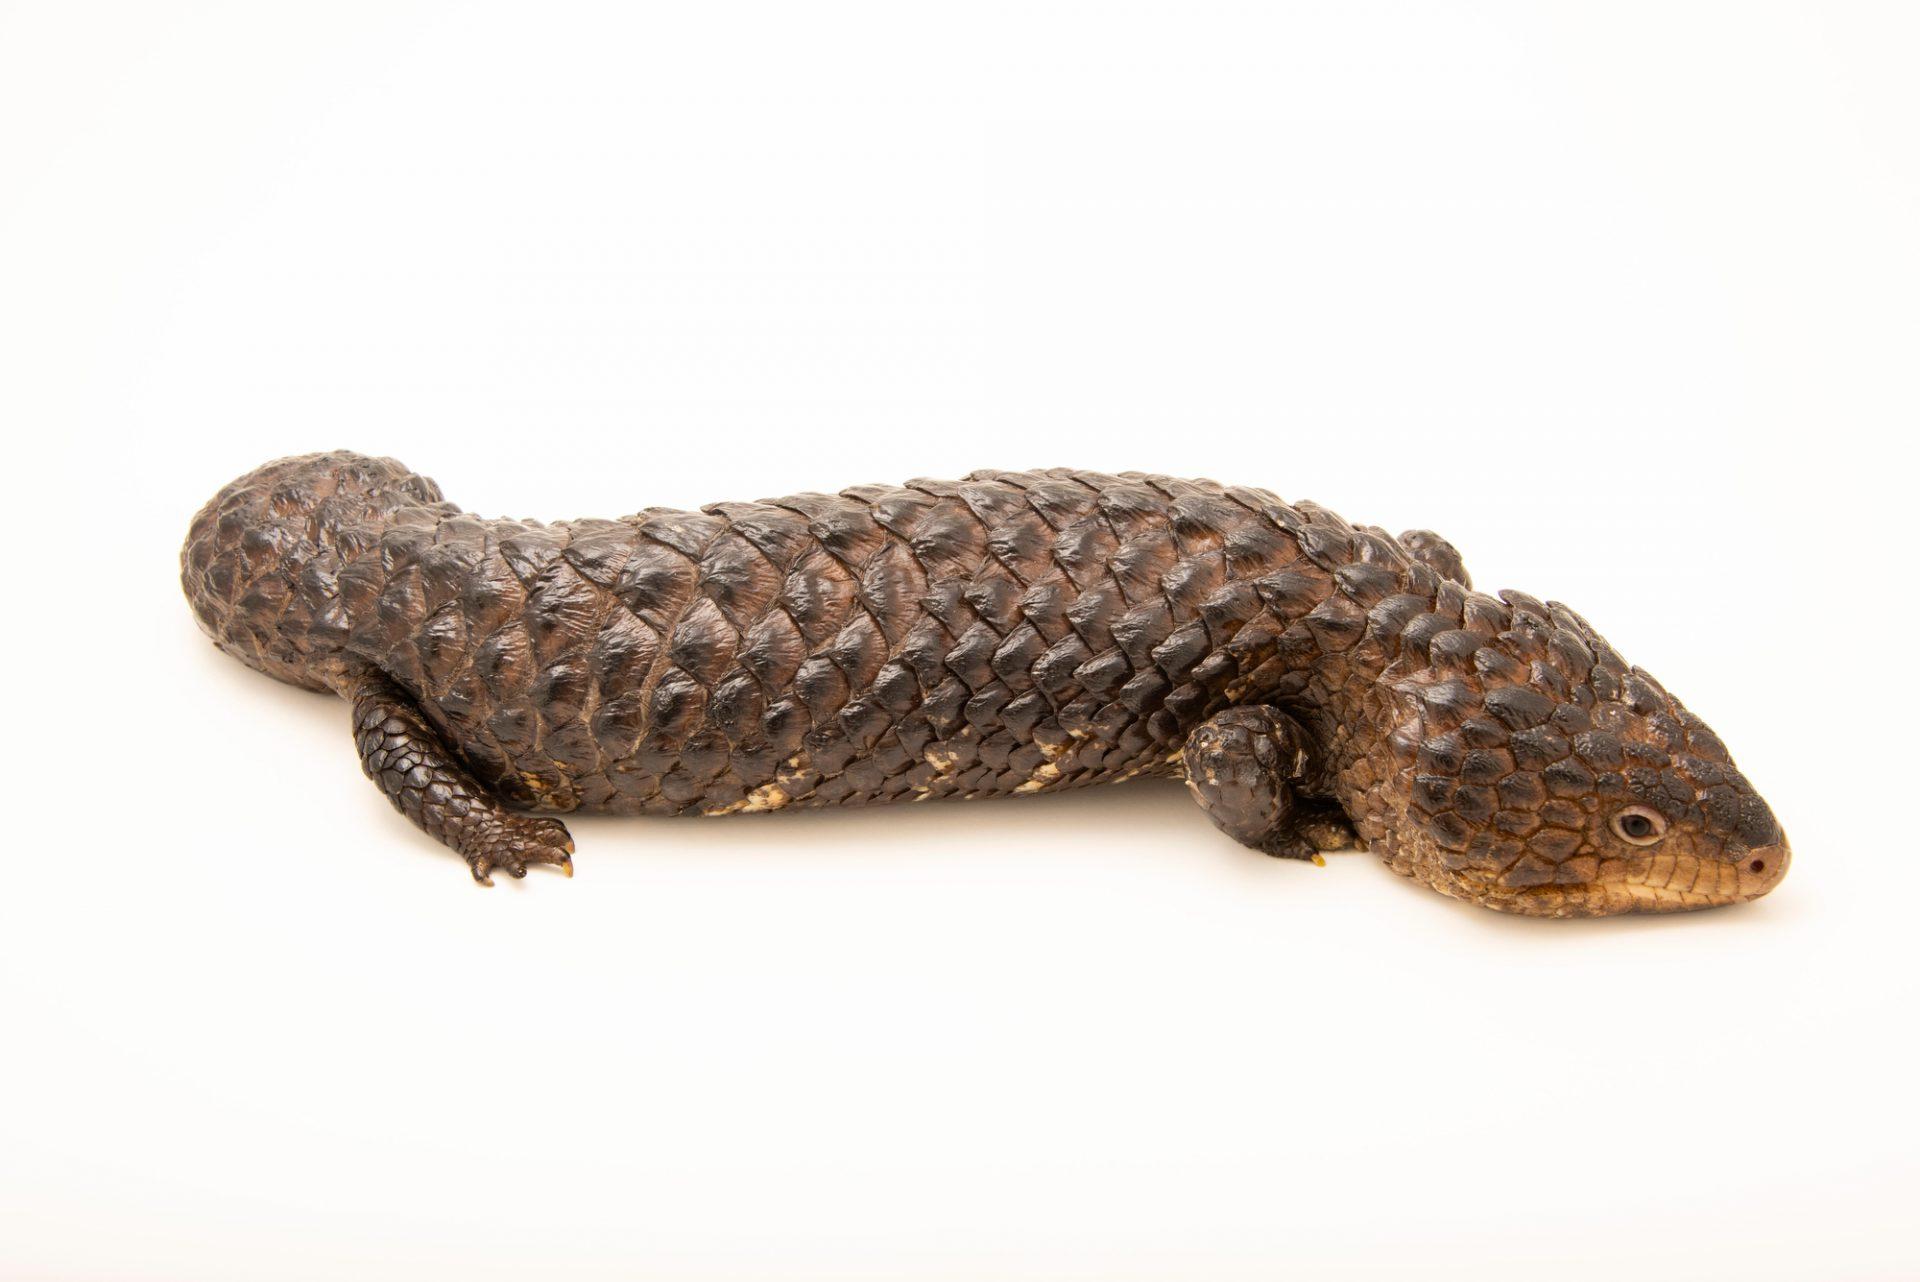 Photo: Shingleback lizard (Tiliqua rugosa) at Moonlit Sanctuary